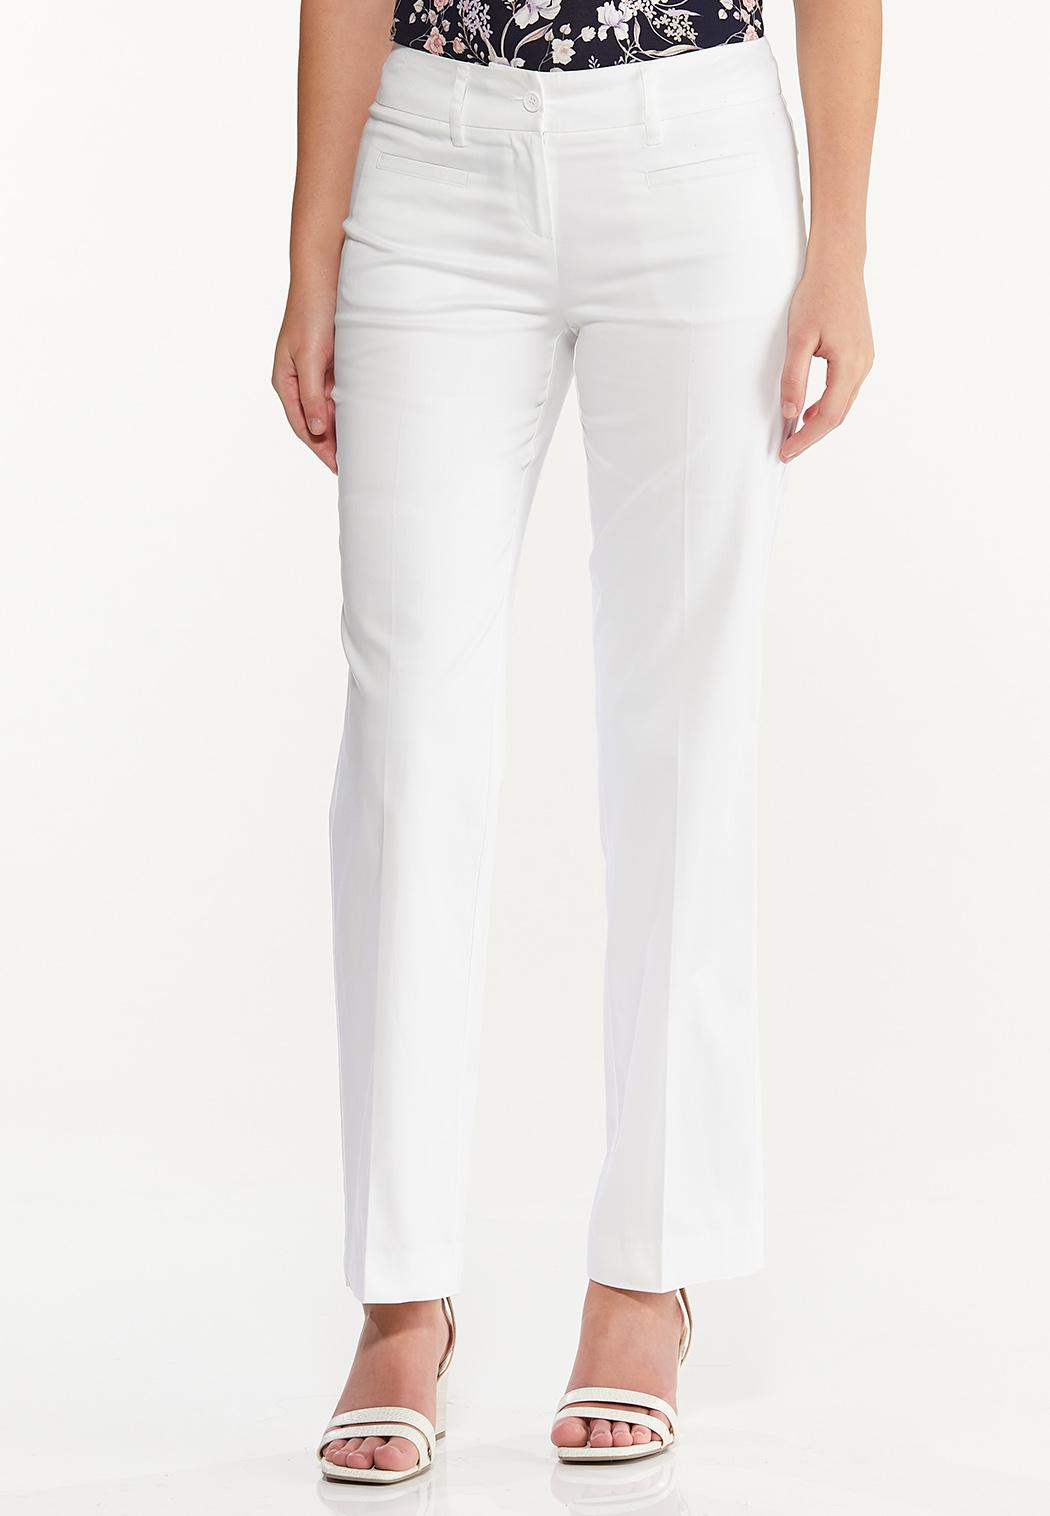 Petite Sateen Trouser Pants